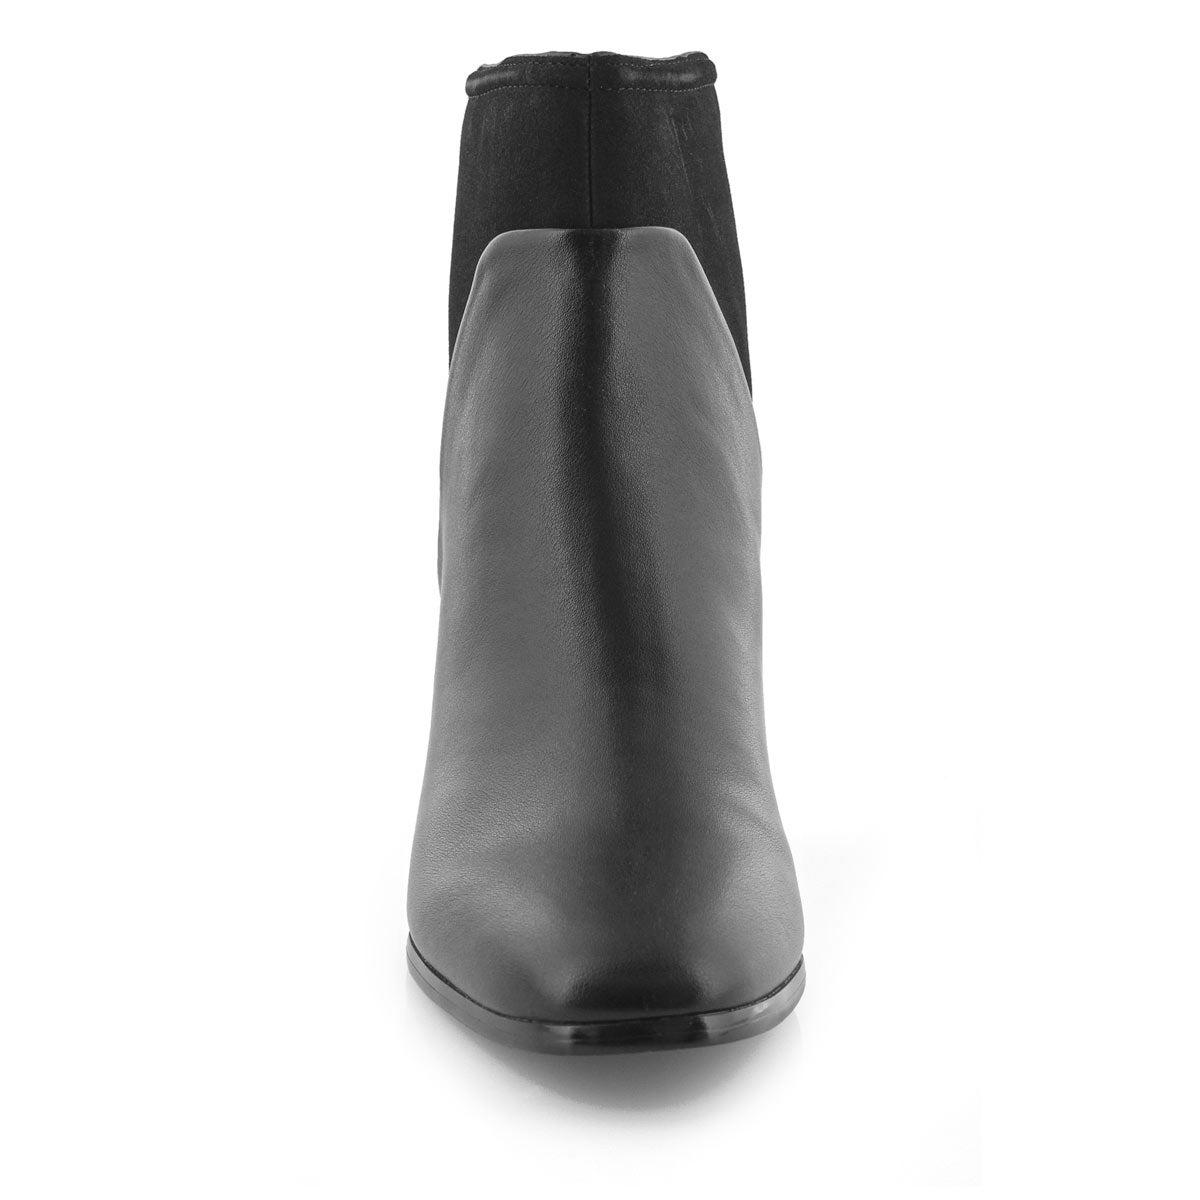 Lds Dea black vegan dress bootie